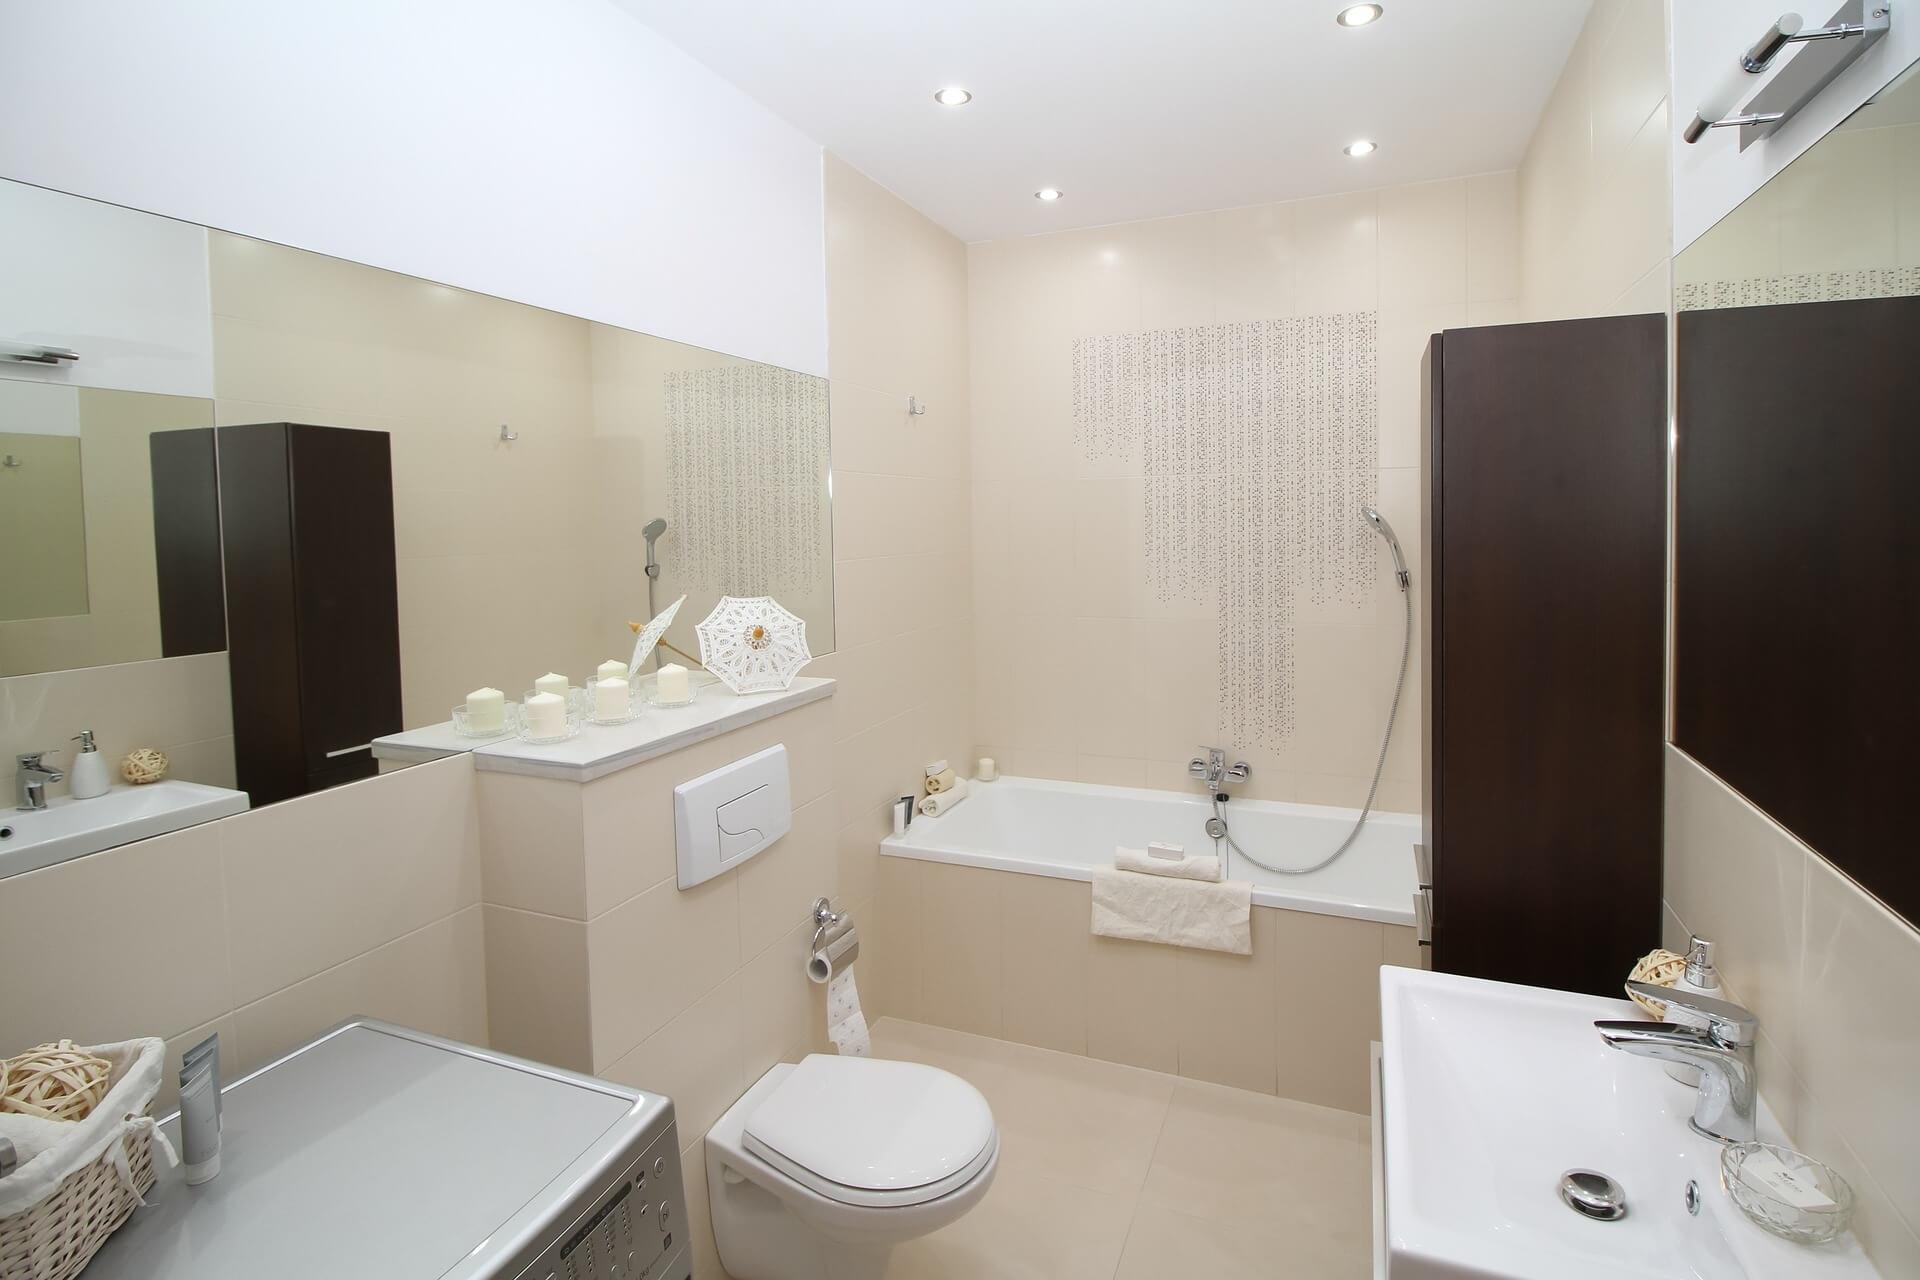 bathroom13 Home Decorating: Bathroom on a Budget